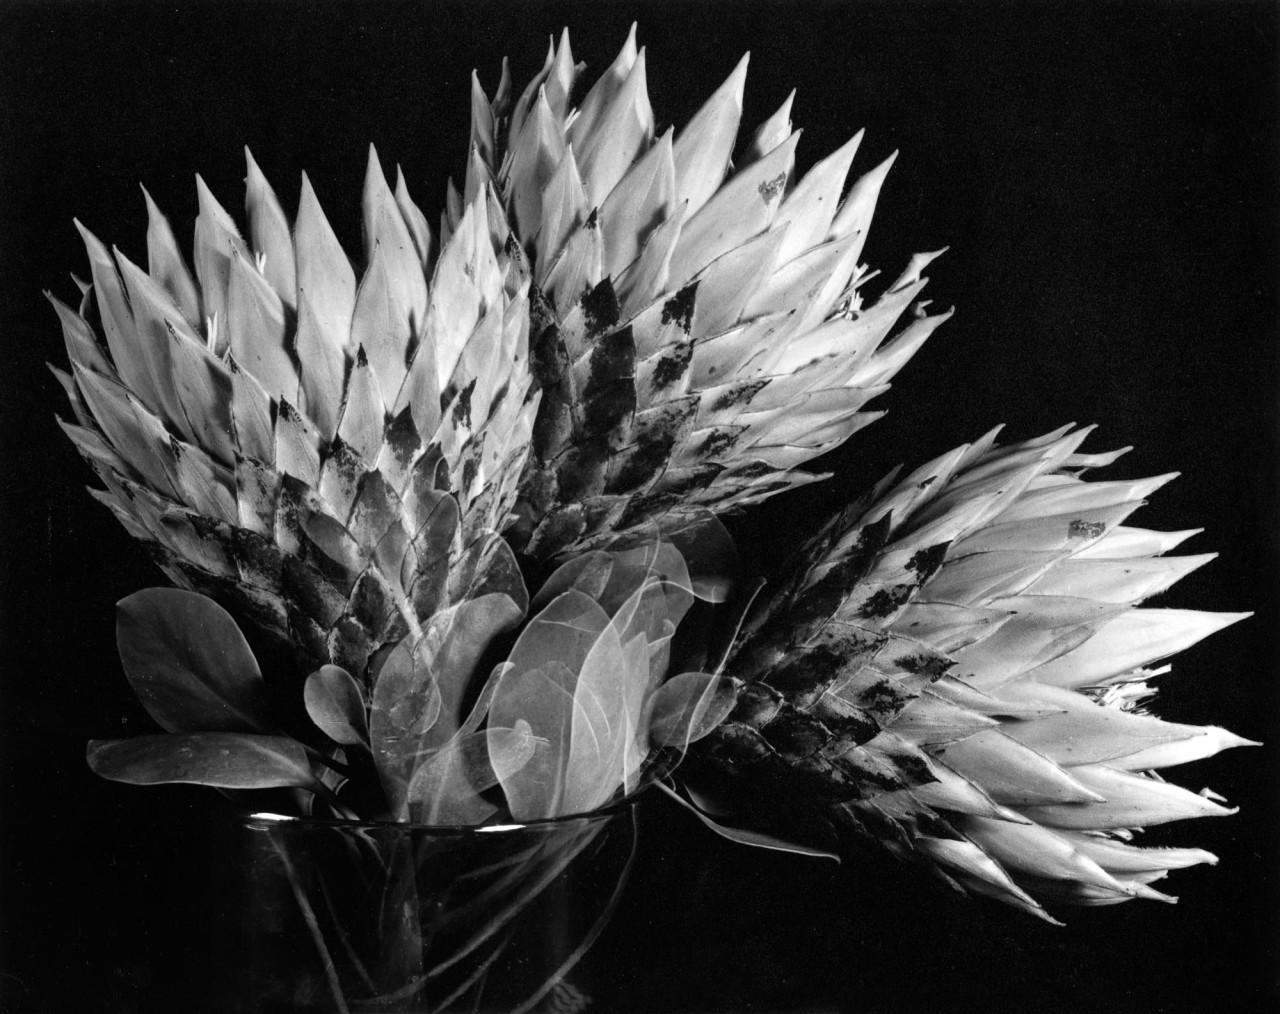 Три протеи, 1935. Фотограф Имоджен Каннингем